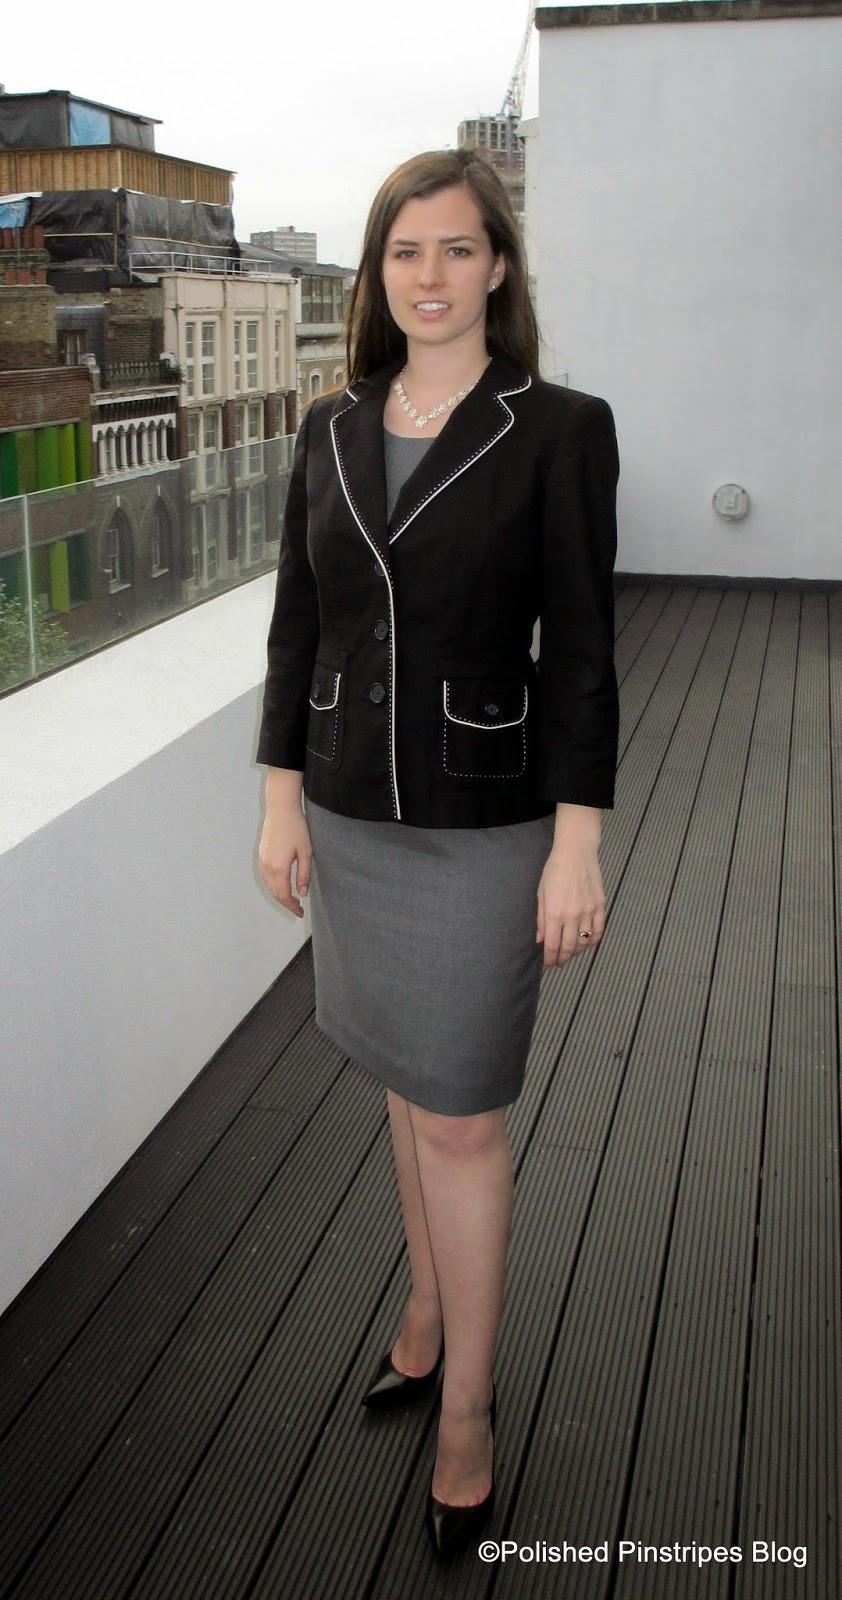 Find great deals on eBay for black dress blazer. Shop with confidence.